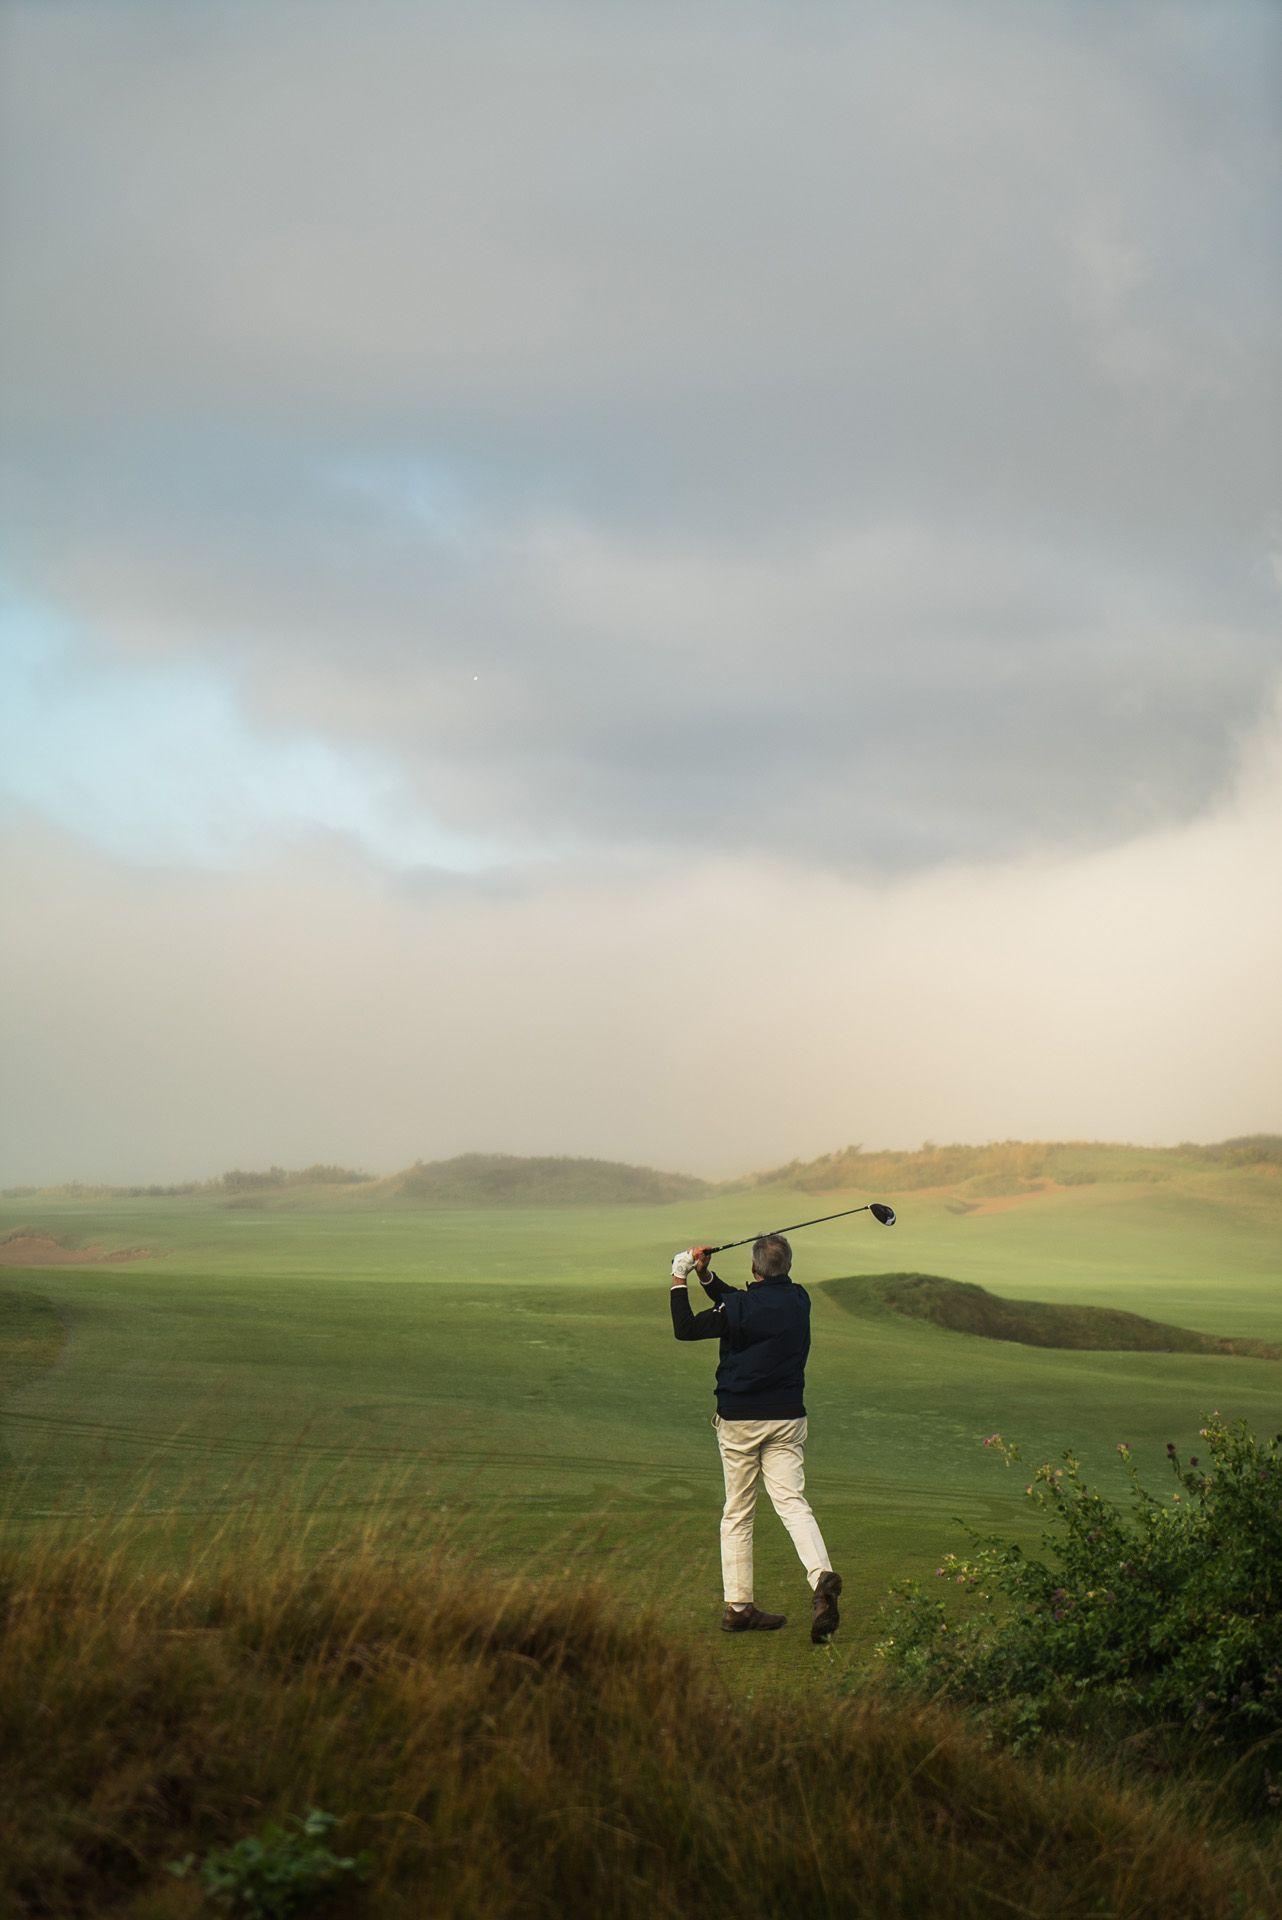 golfer swinging by Bruno Florin for Mercedes Magazine